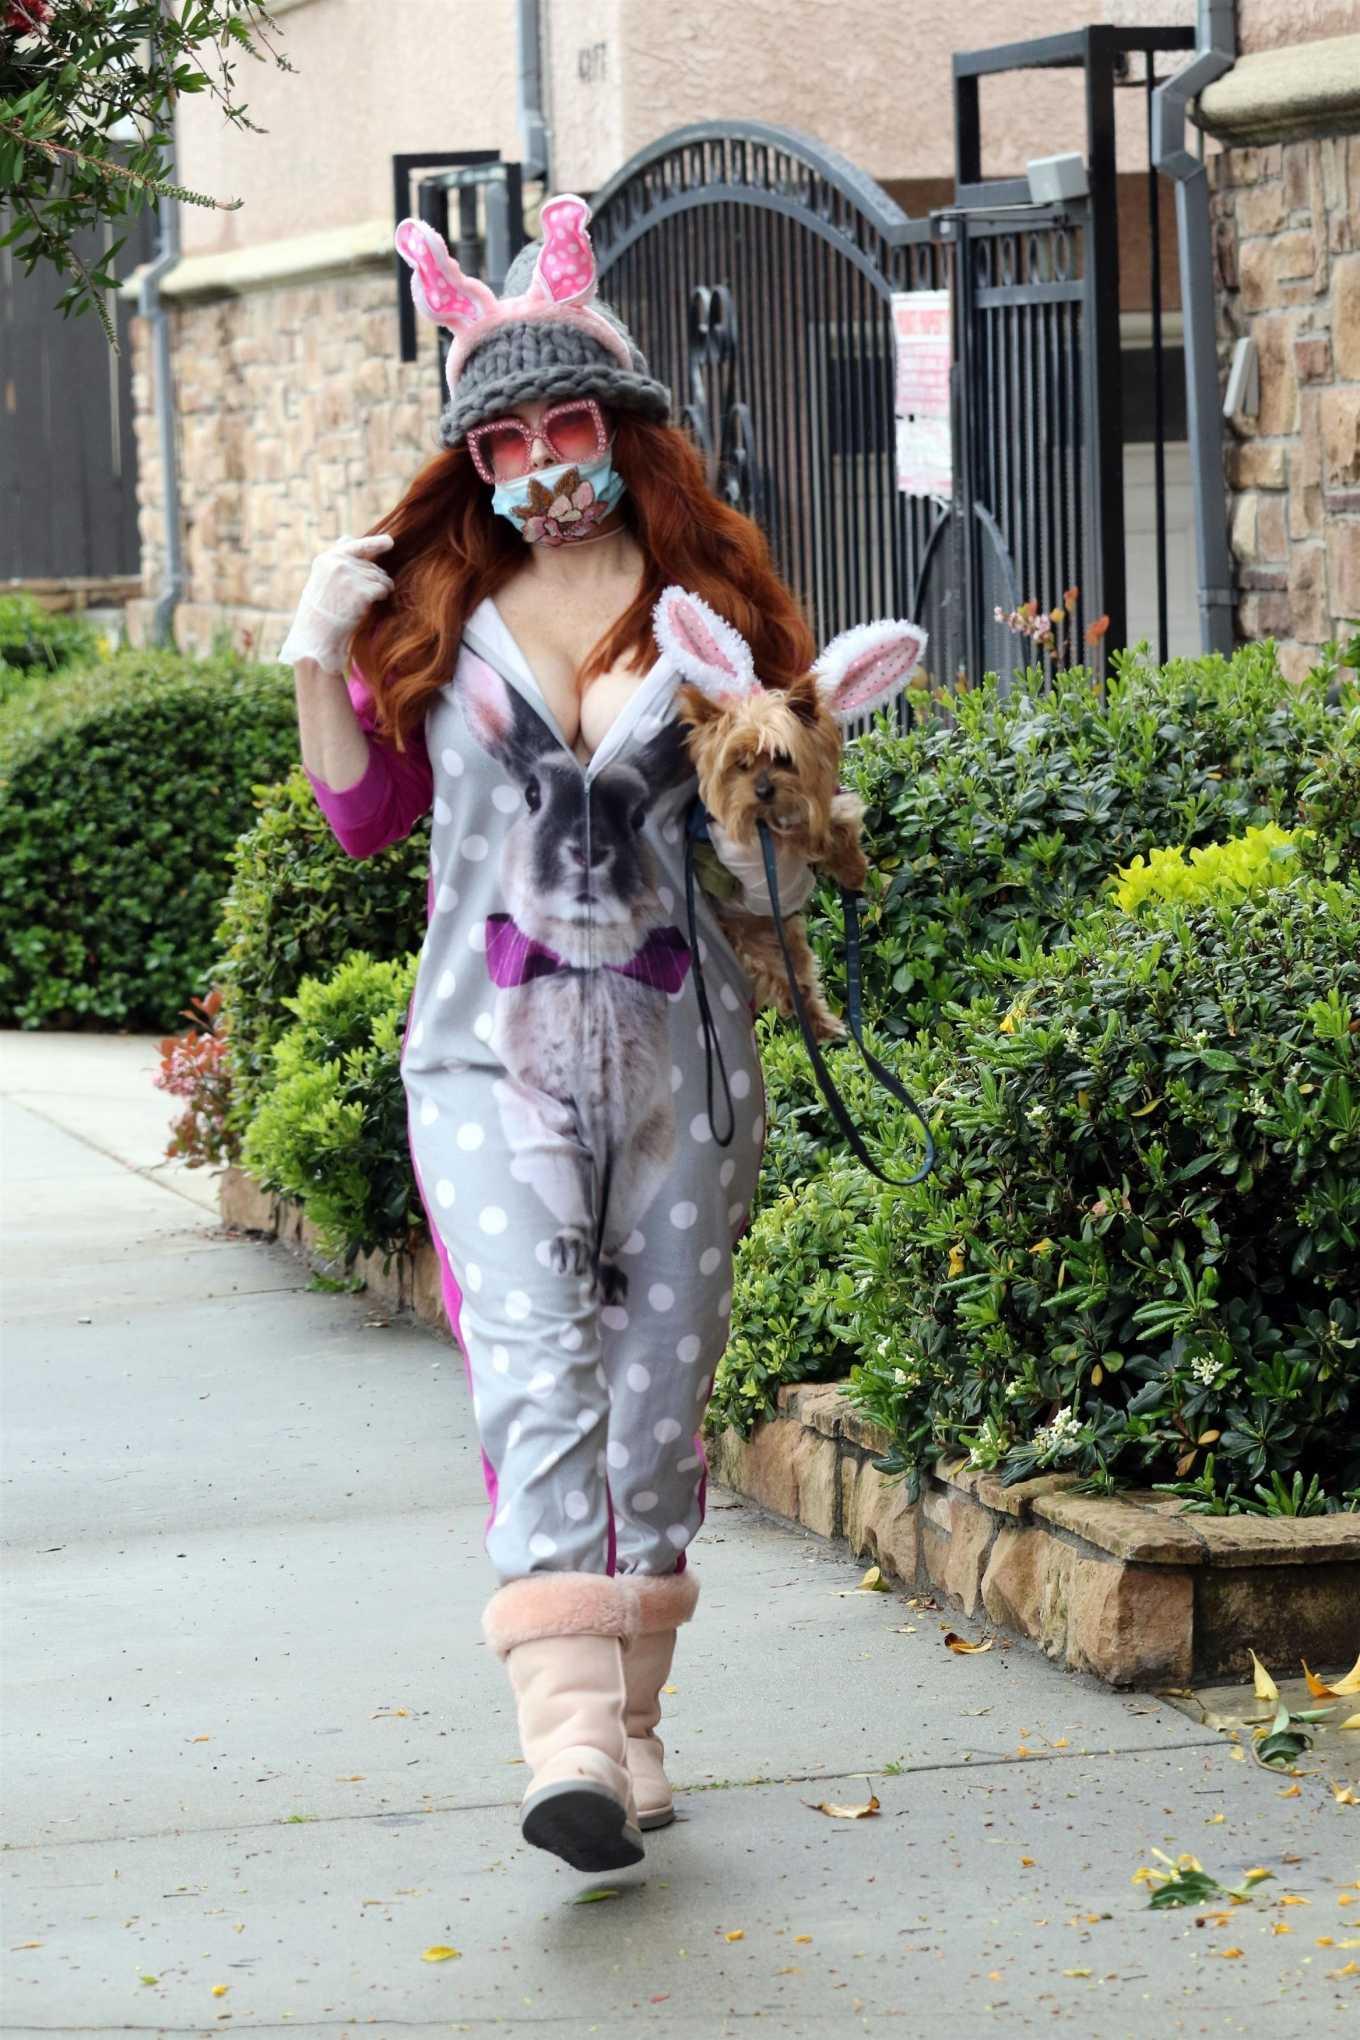 Phoebe Price - Wear Easter Bunny ears and anti-coronavirus mask in LA